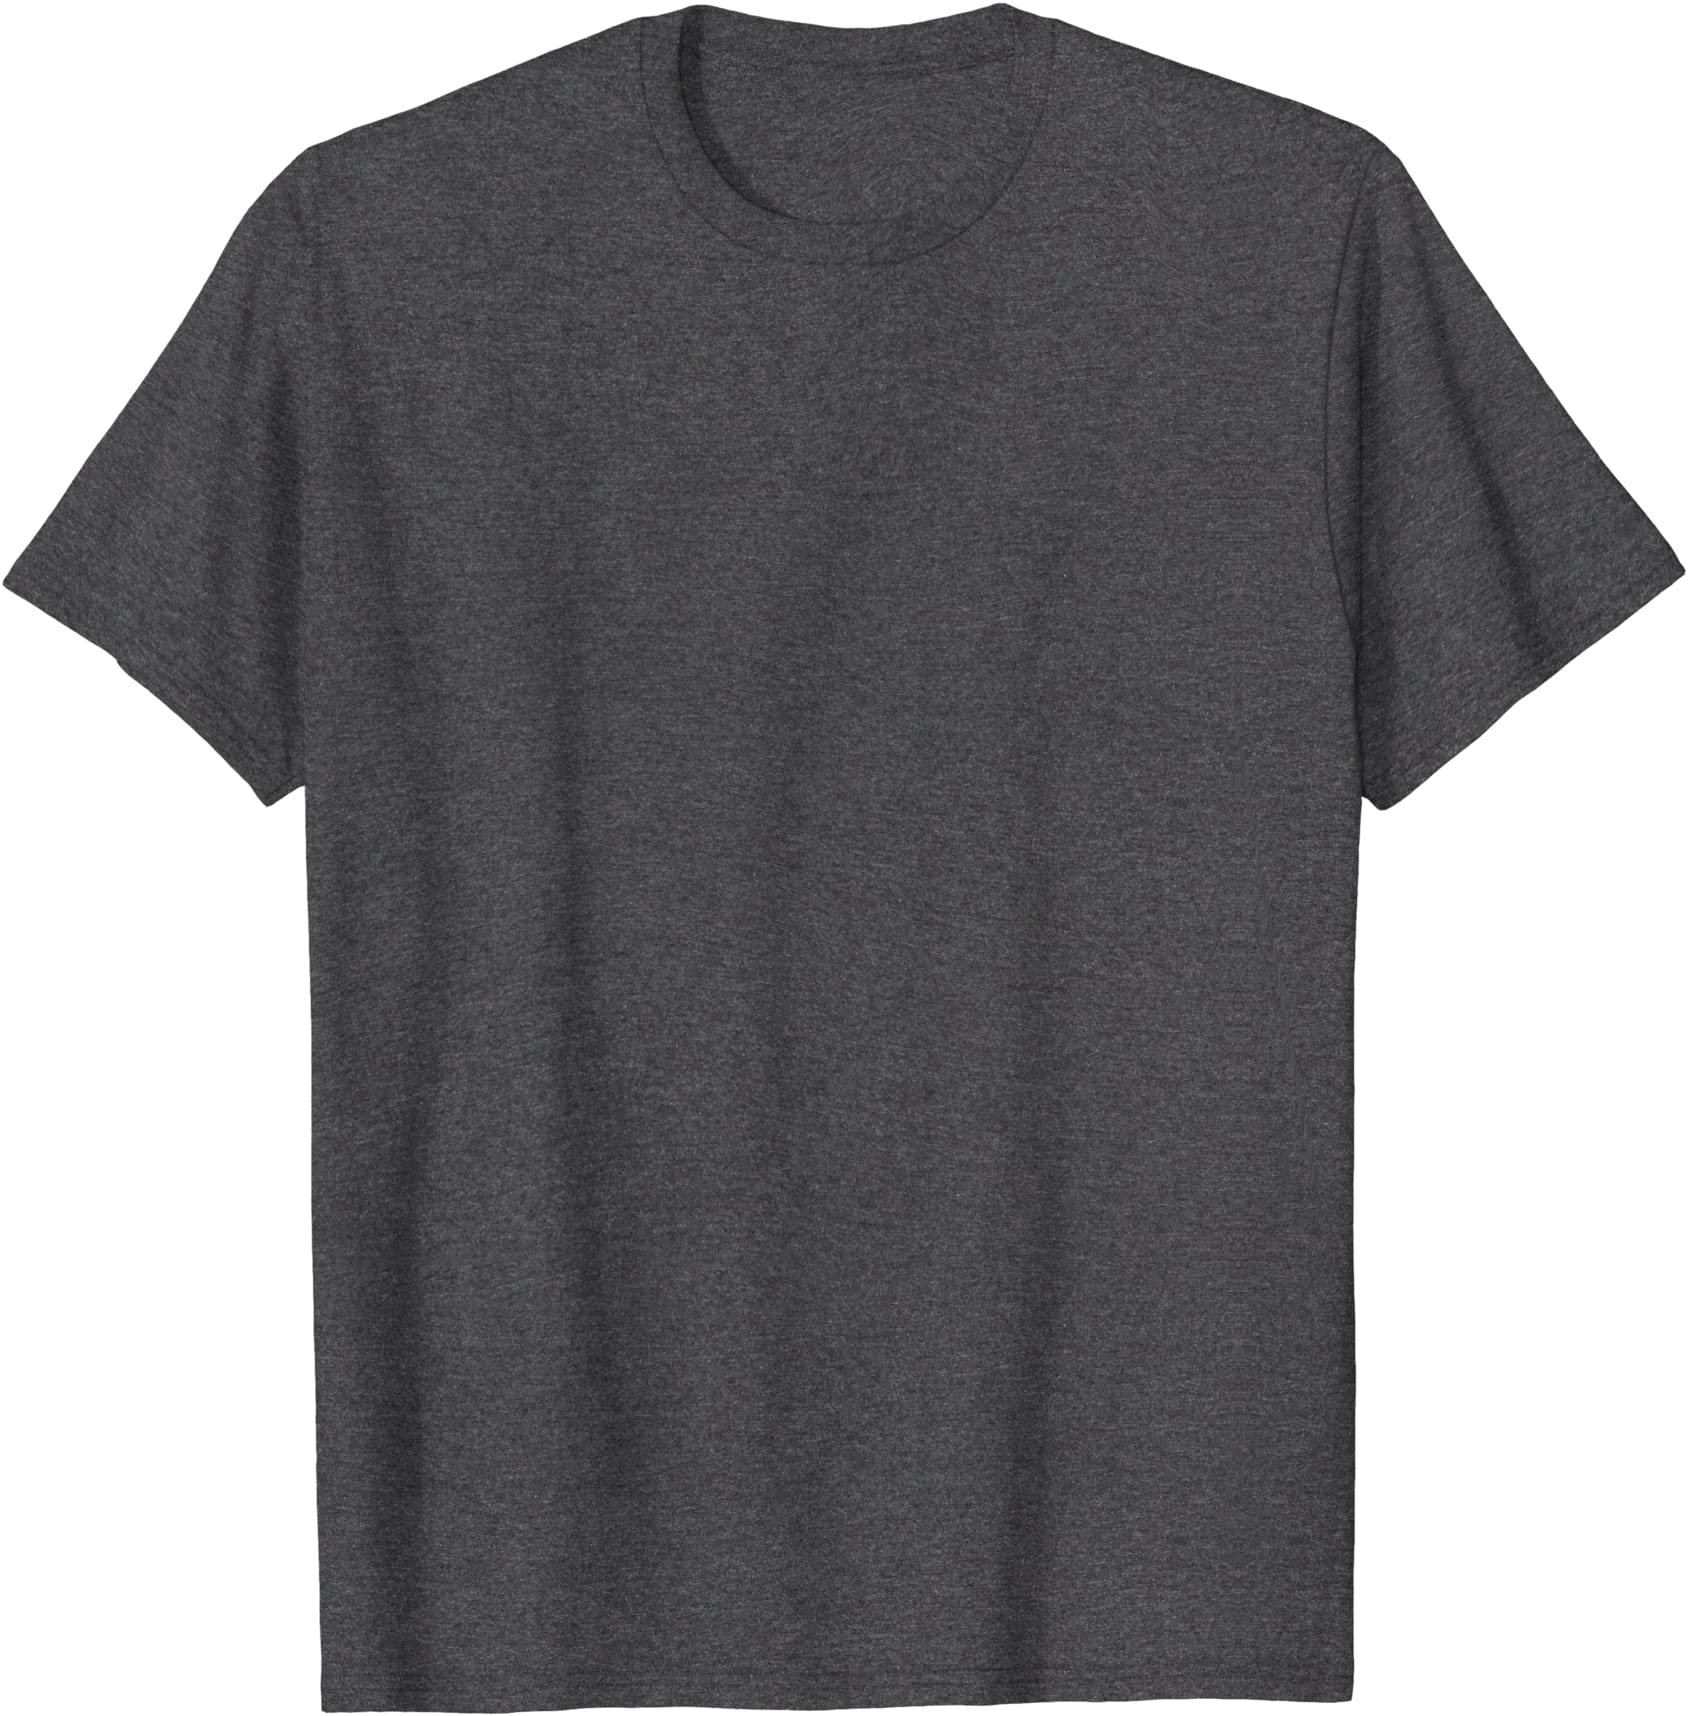 Dream Stoner Weed Marijuana Pot Graphic Gift Long Sleeve Tees Shirts T-Shirts